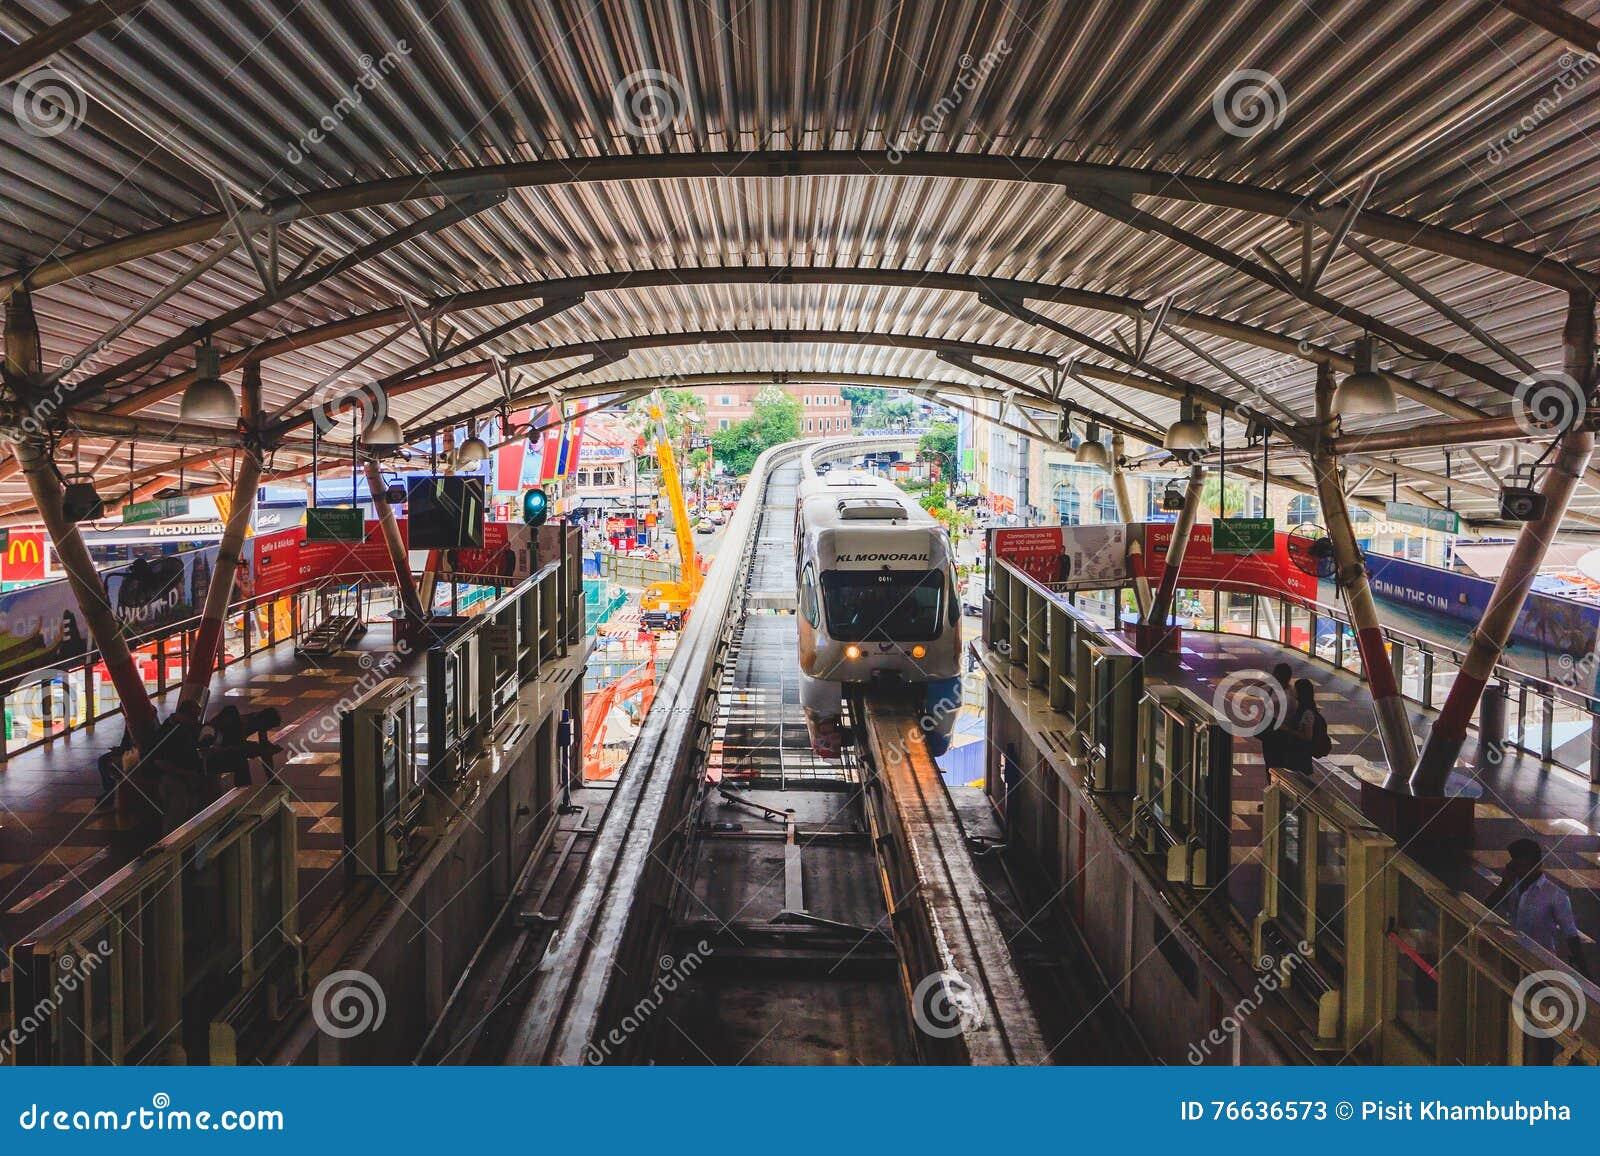 Einschienenbahnstation von Bukit Bintang in Kuala Lumpur, Malaysia